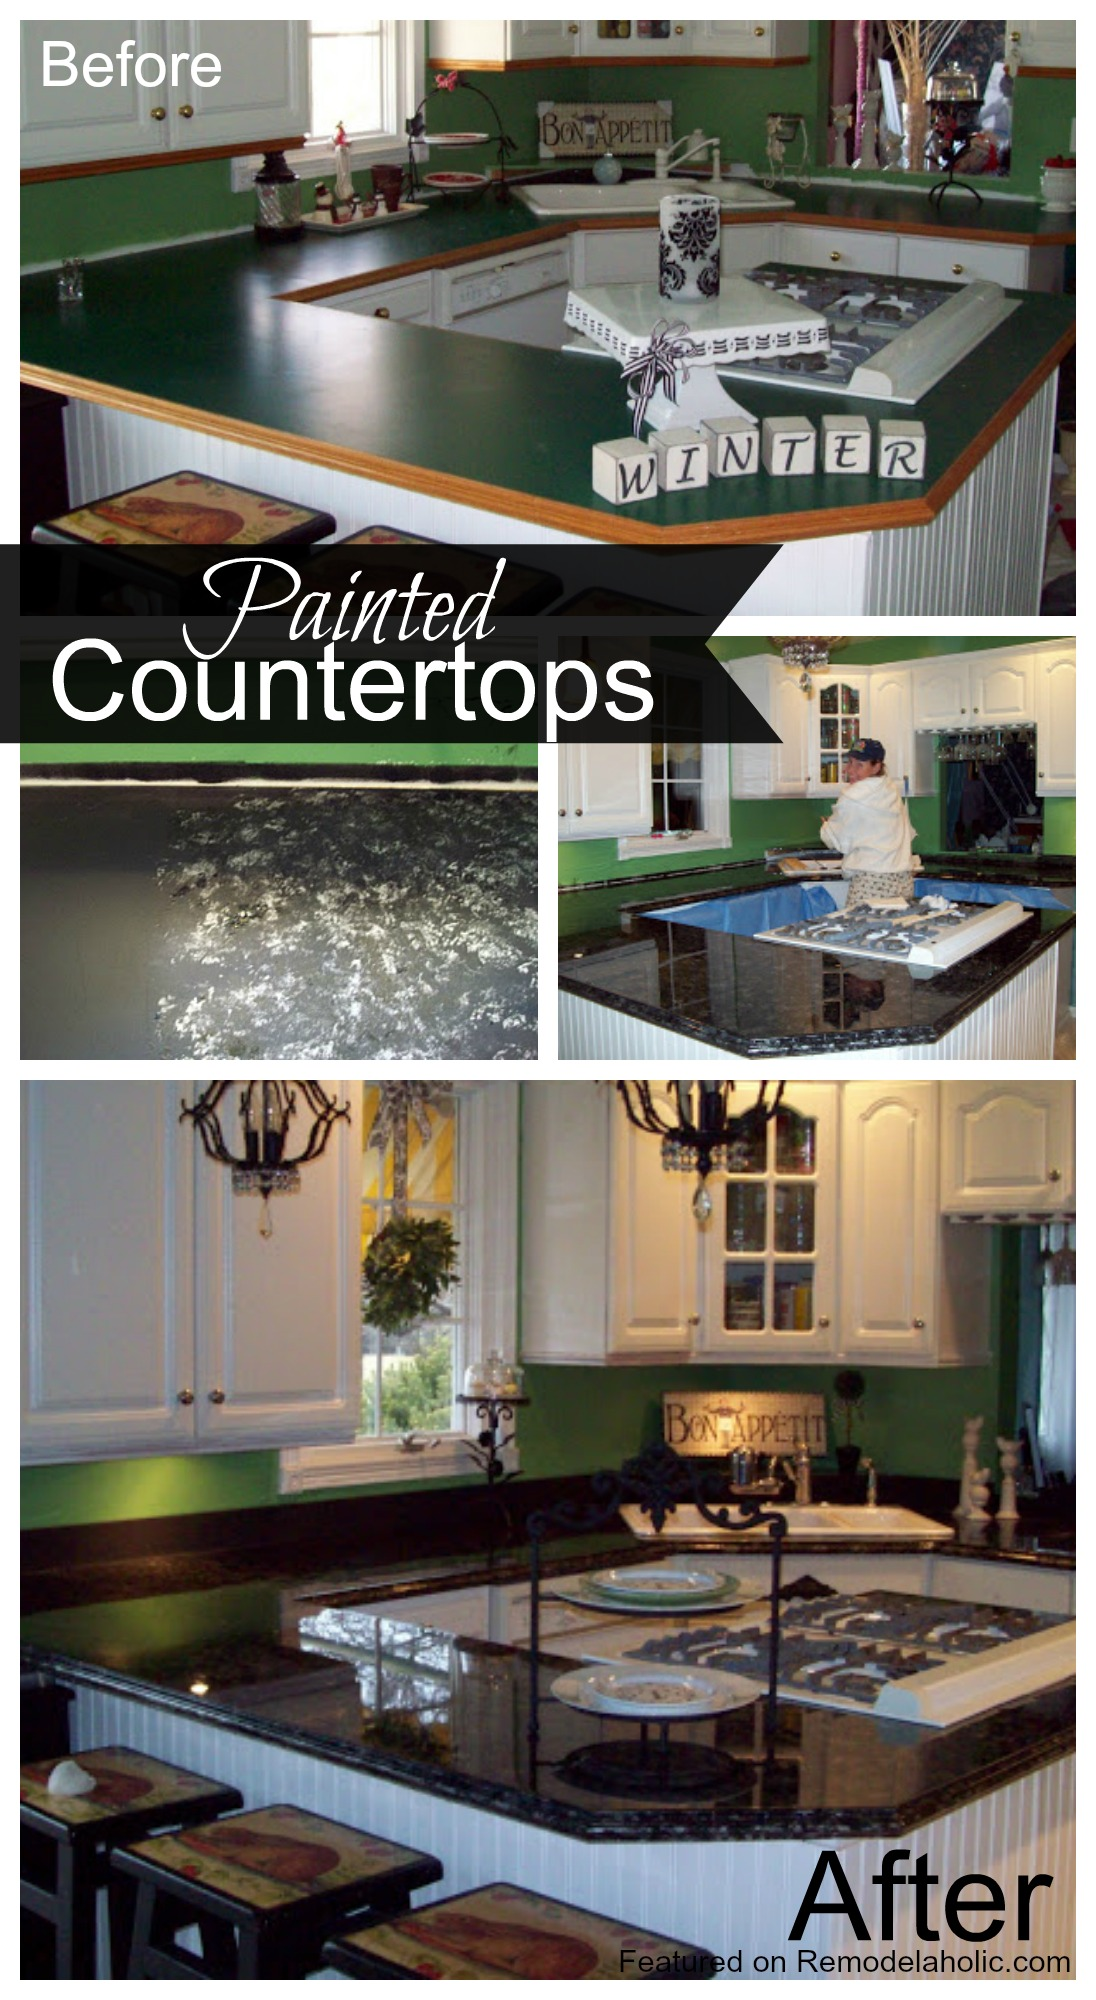 Painted Countertop Tutorial